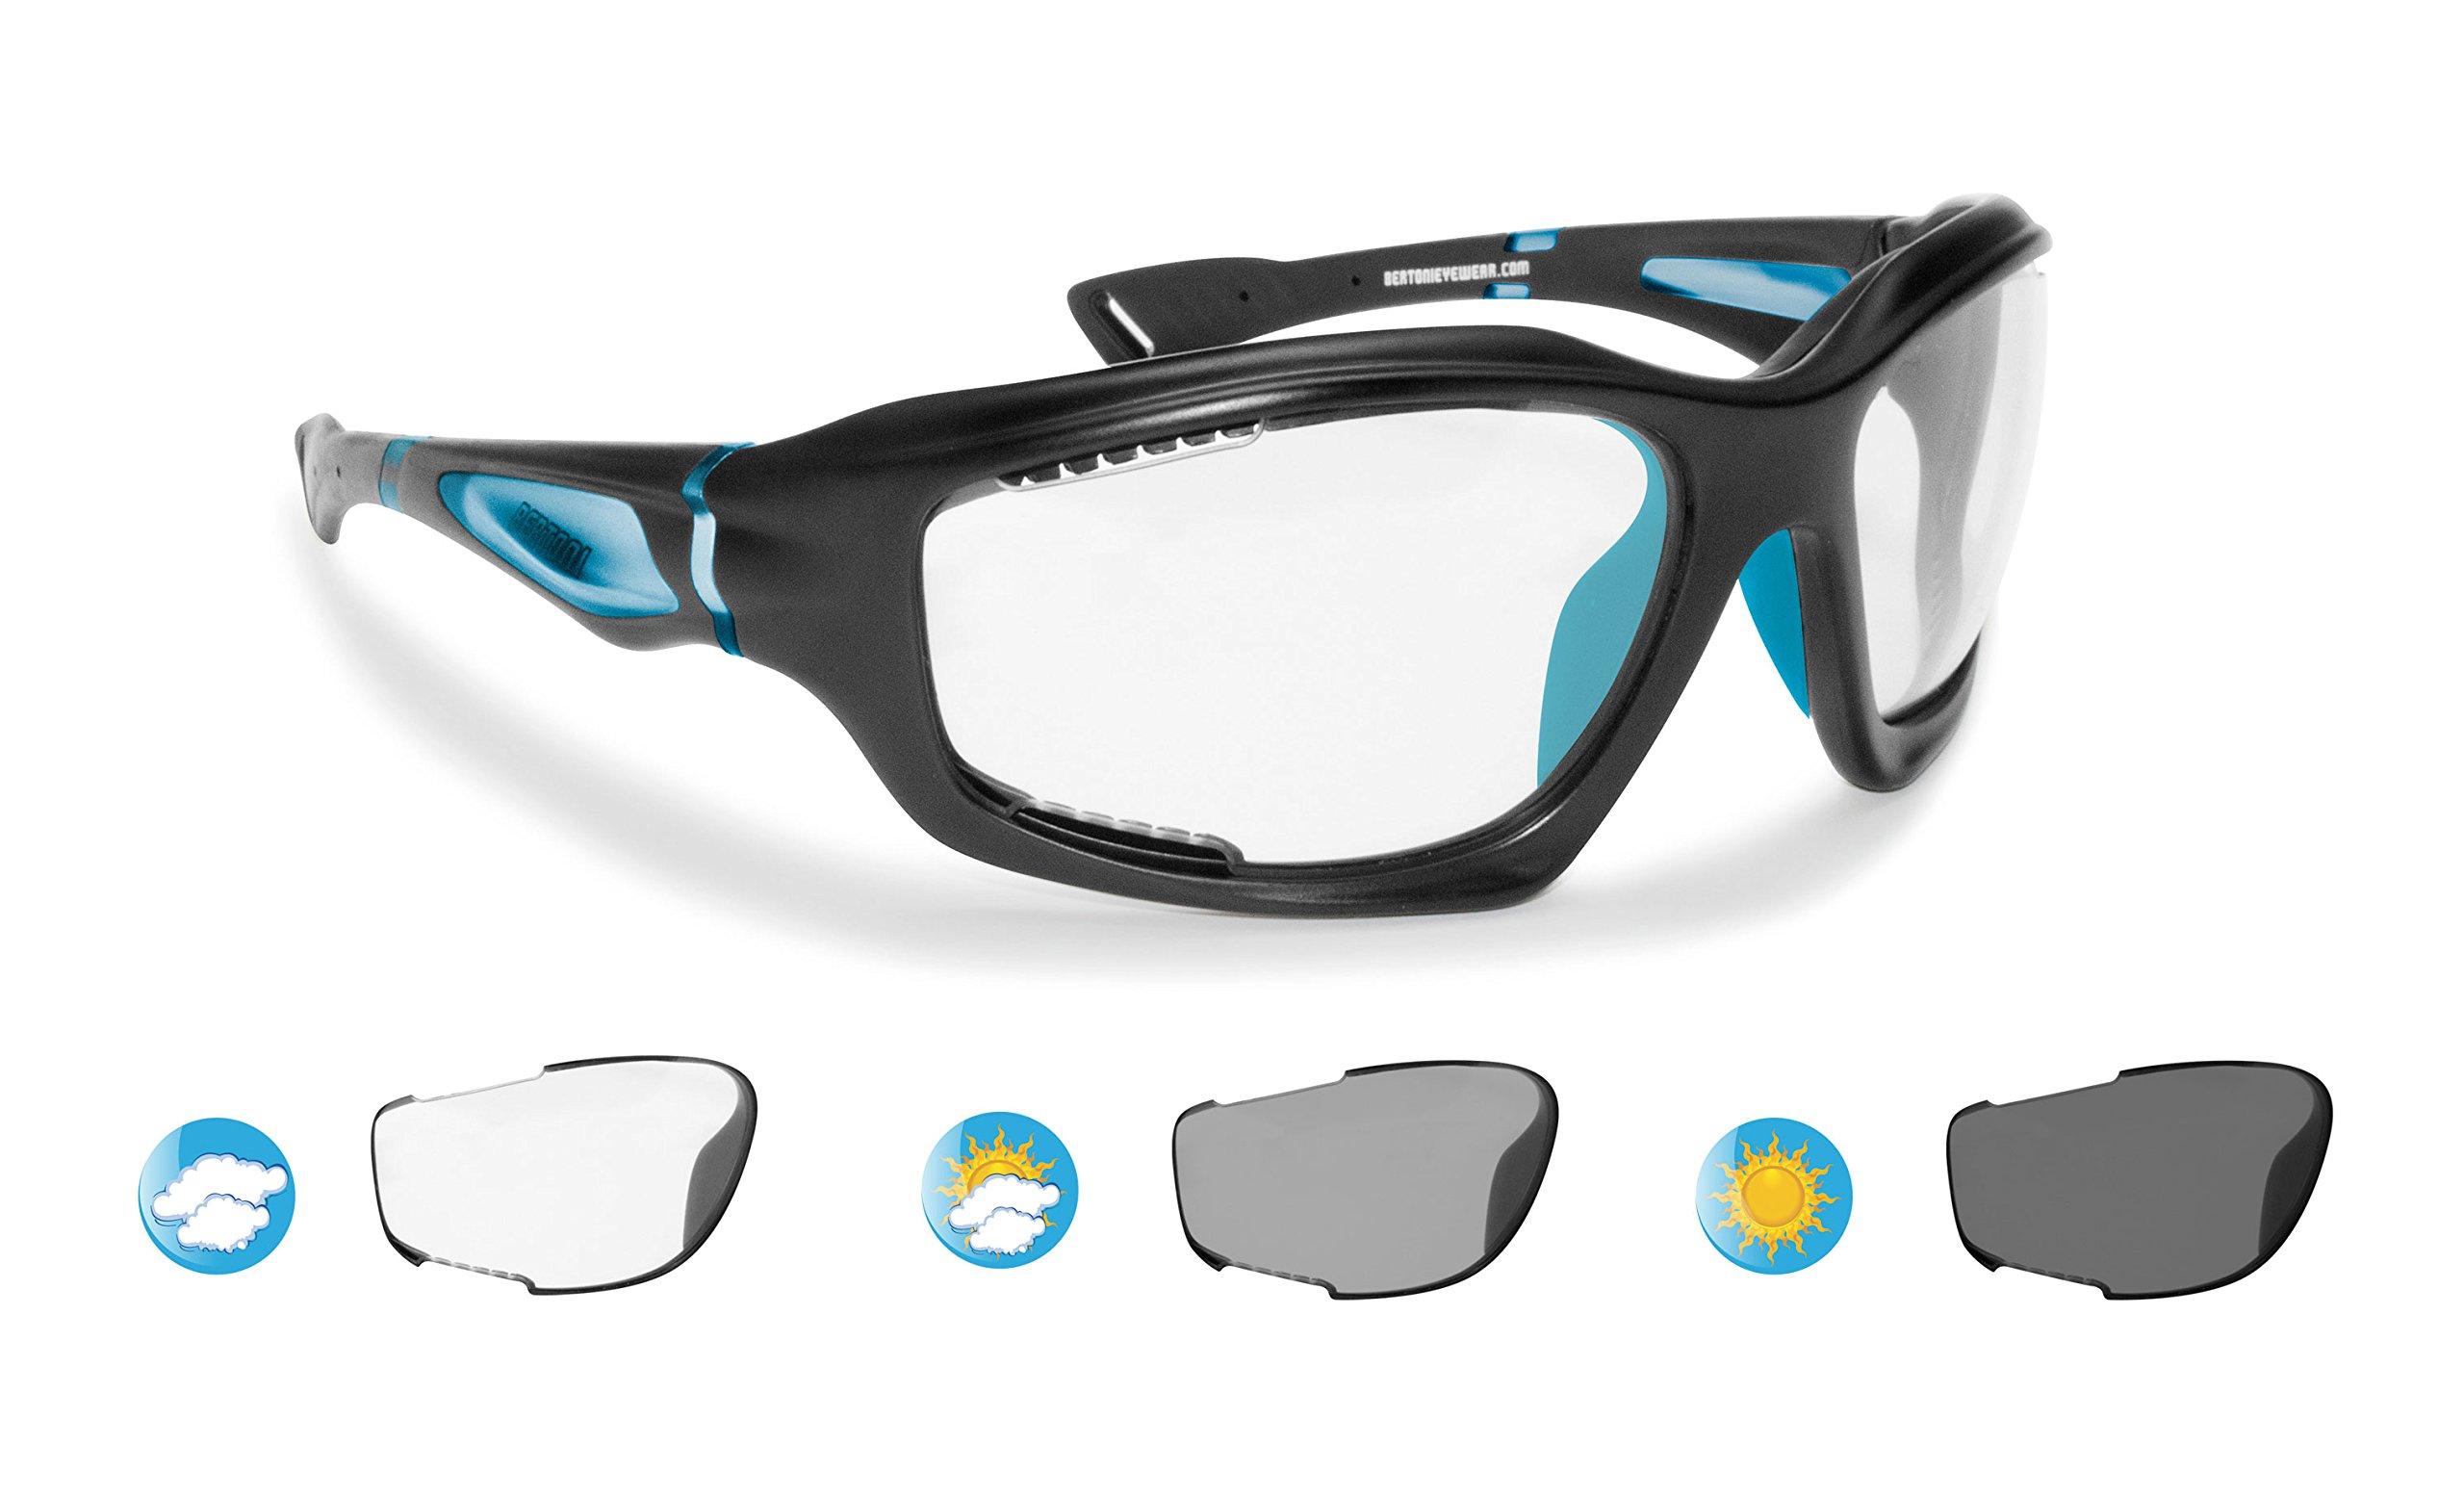 Bertoni Sport Sunglasses Photochromic cat. 0-3 Antifog for Cycling Running Golf Ski Watersports - F1000D1 Wraparound Windproof Glasses (Mat Pearl Black/Mat Blue, Photochromic Antifog)